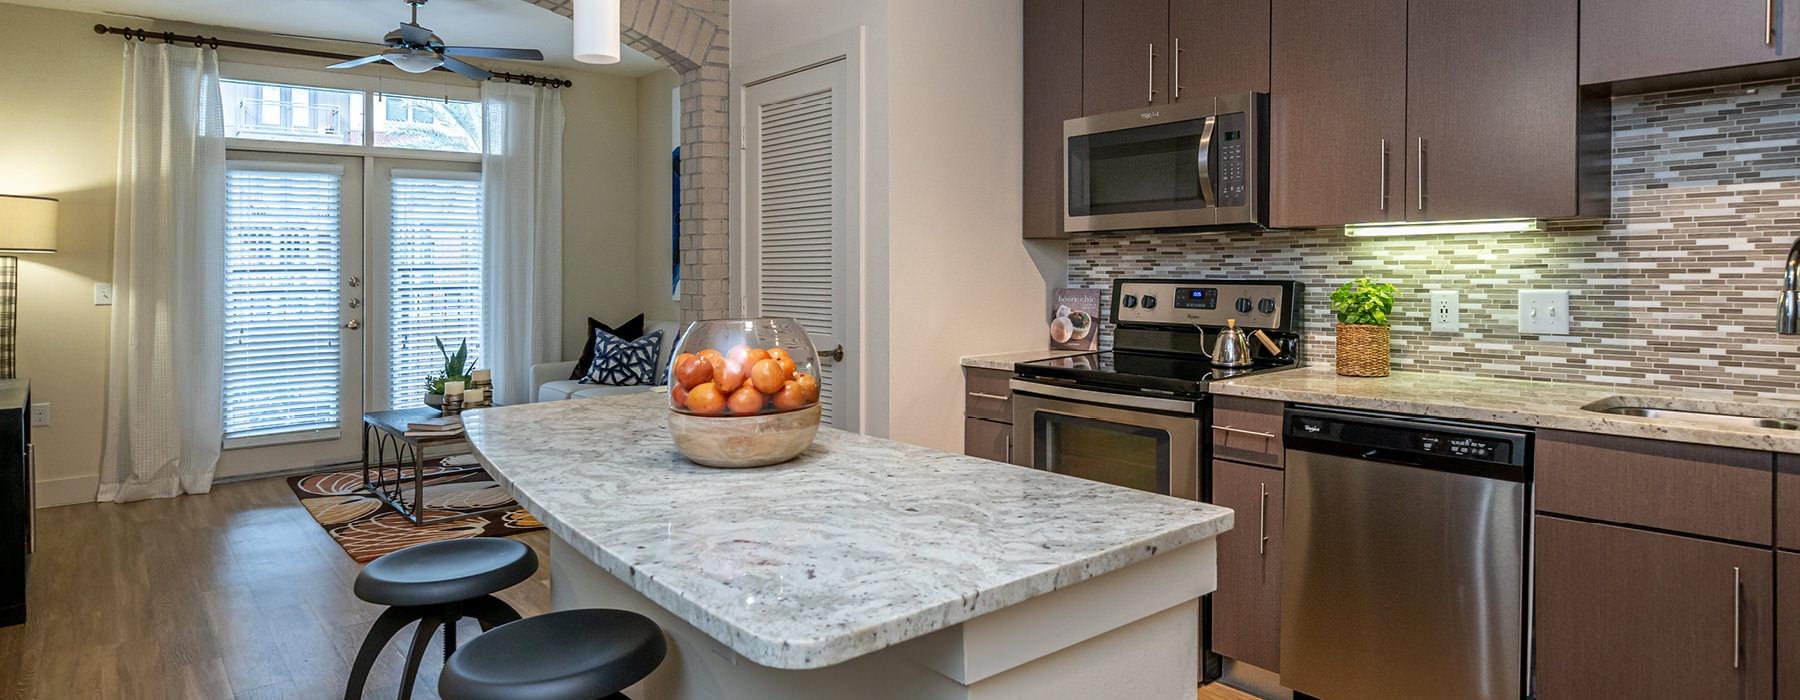 open concept kitchen adjacent to living room